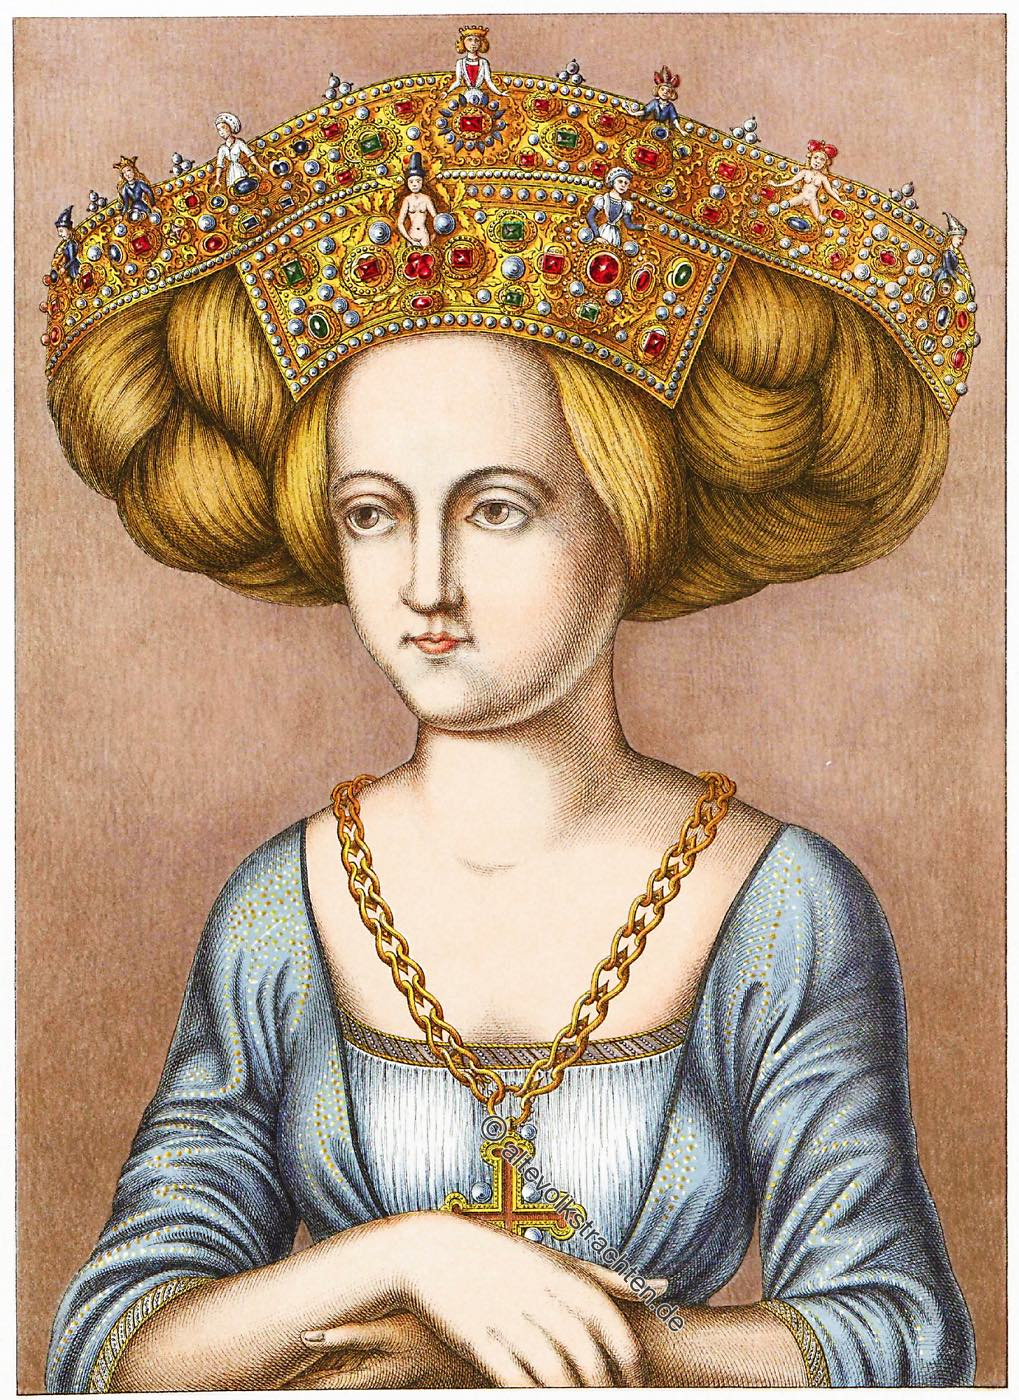 Nuremberg, patrician, bridal, crown, Renaissance, Hefner-Alteneck, Patriciate